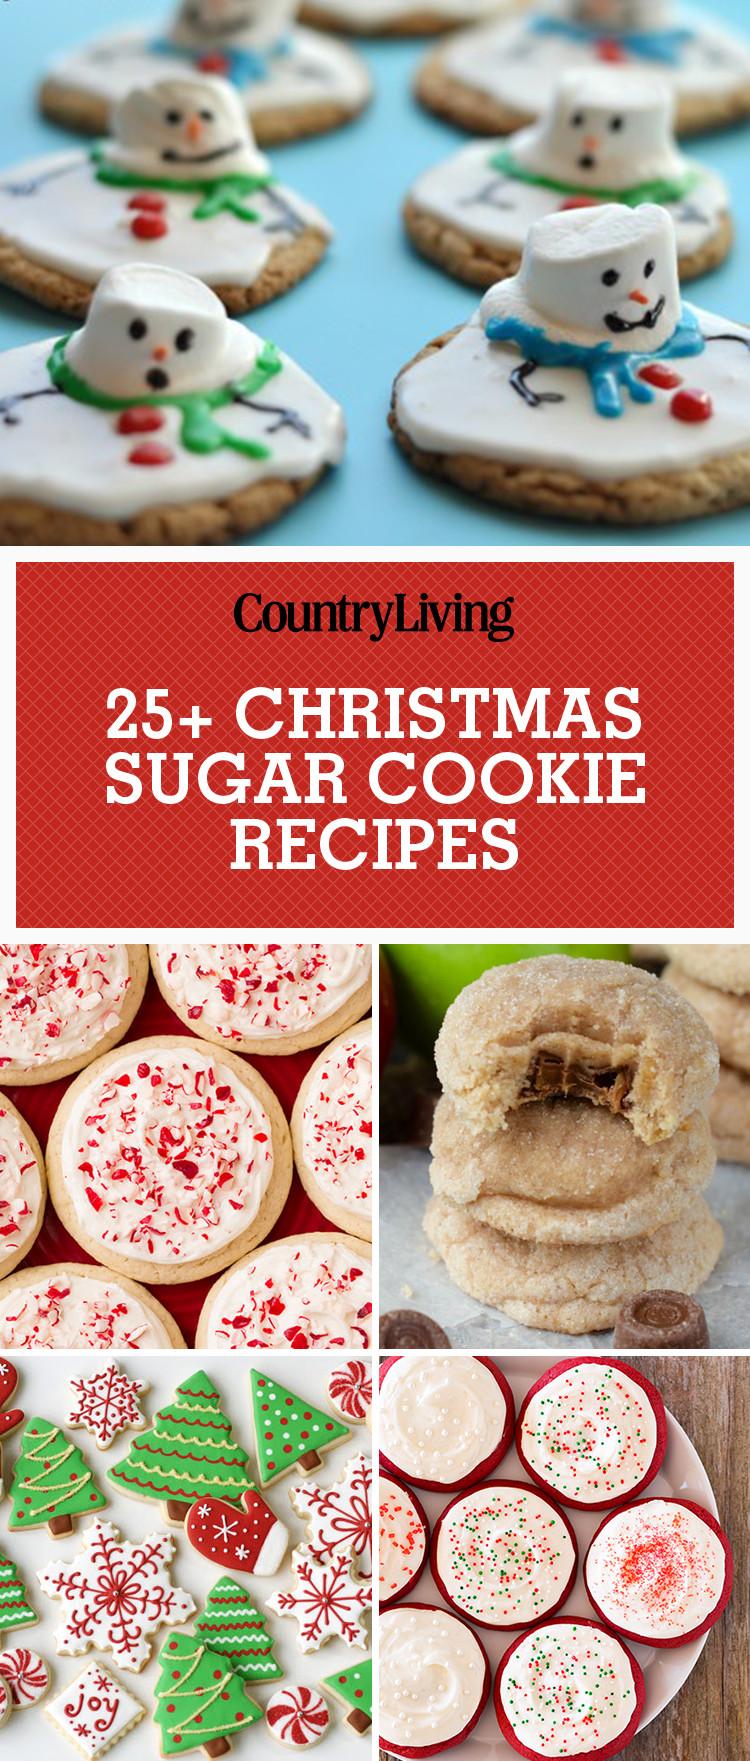 Sugar Cookies Recipe Christmas  25 Easy Christmas Sugar Cookies Recipes & Decorating